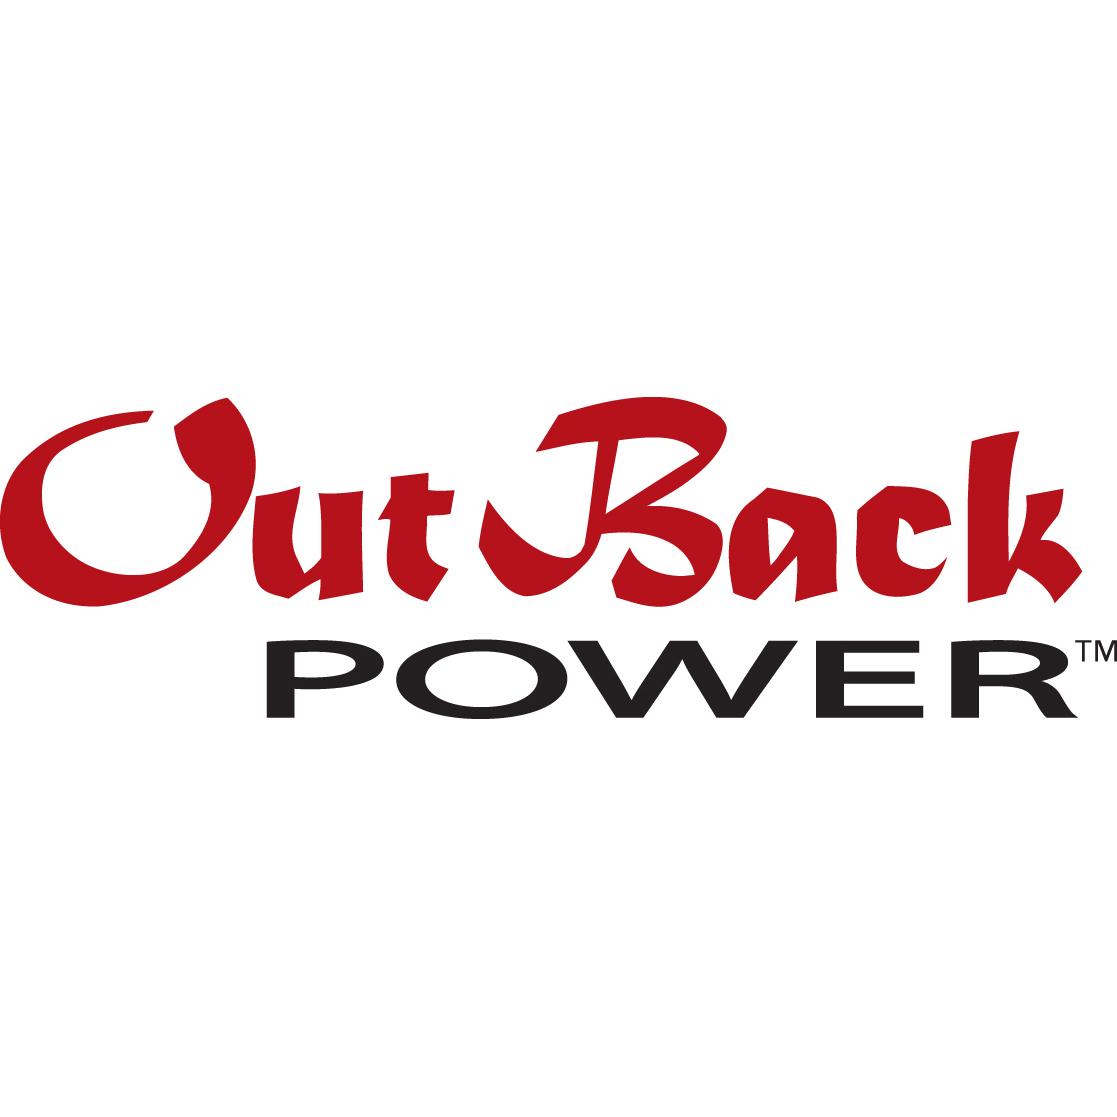 OutBack Power - Twende Solar - 26kW Solar PV Install - Stephen Mazujian Middle School - Siem Reap, Cambodia